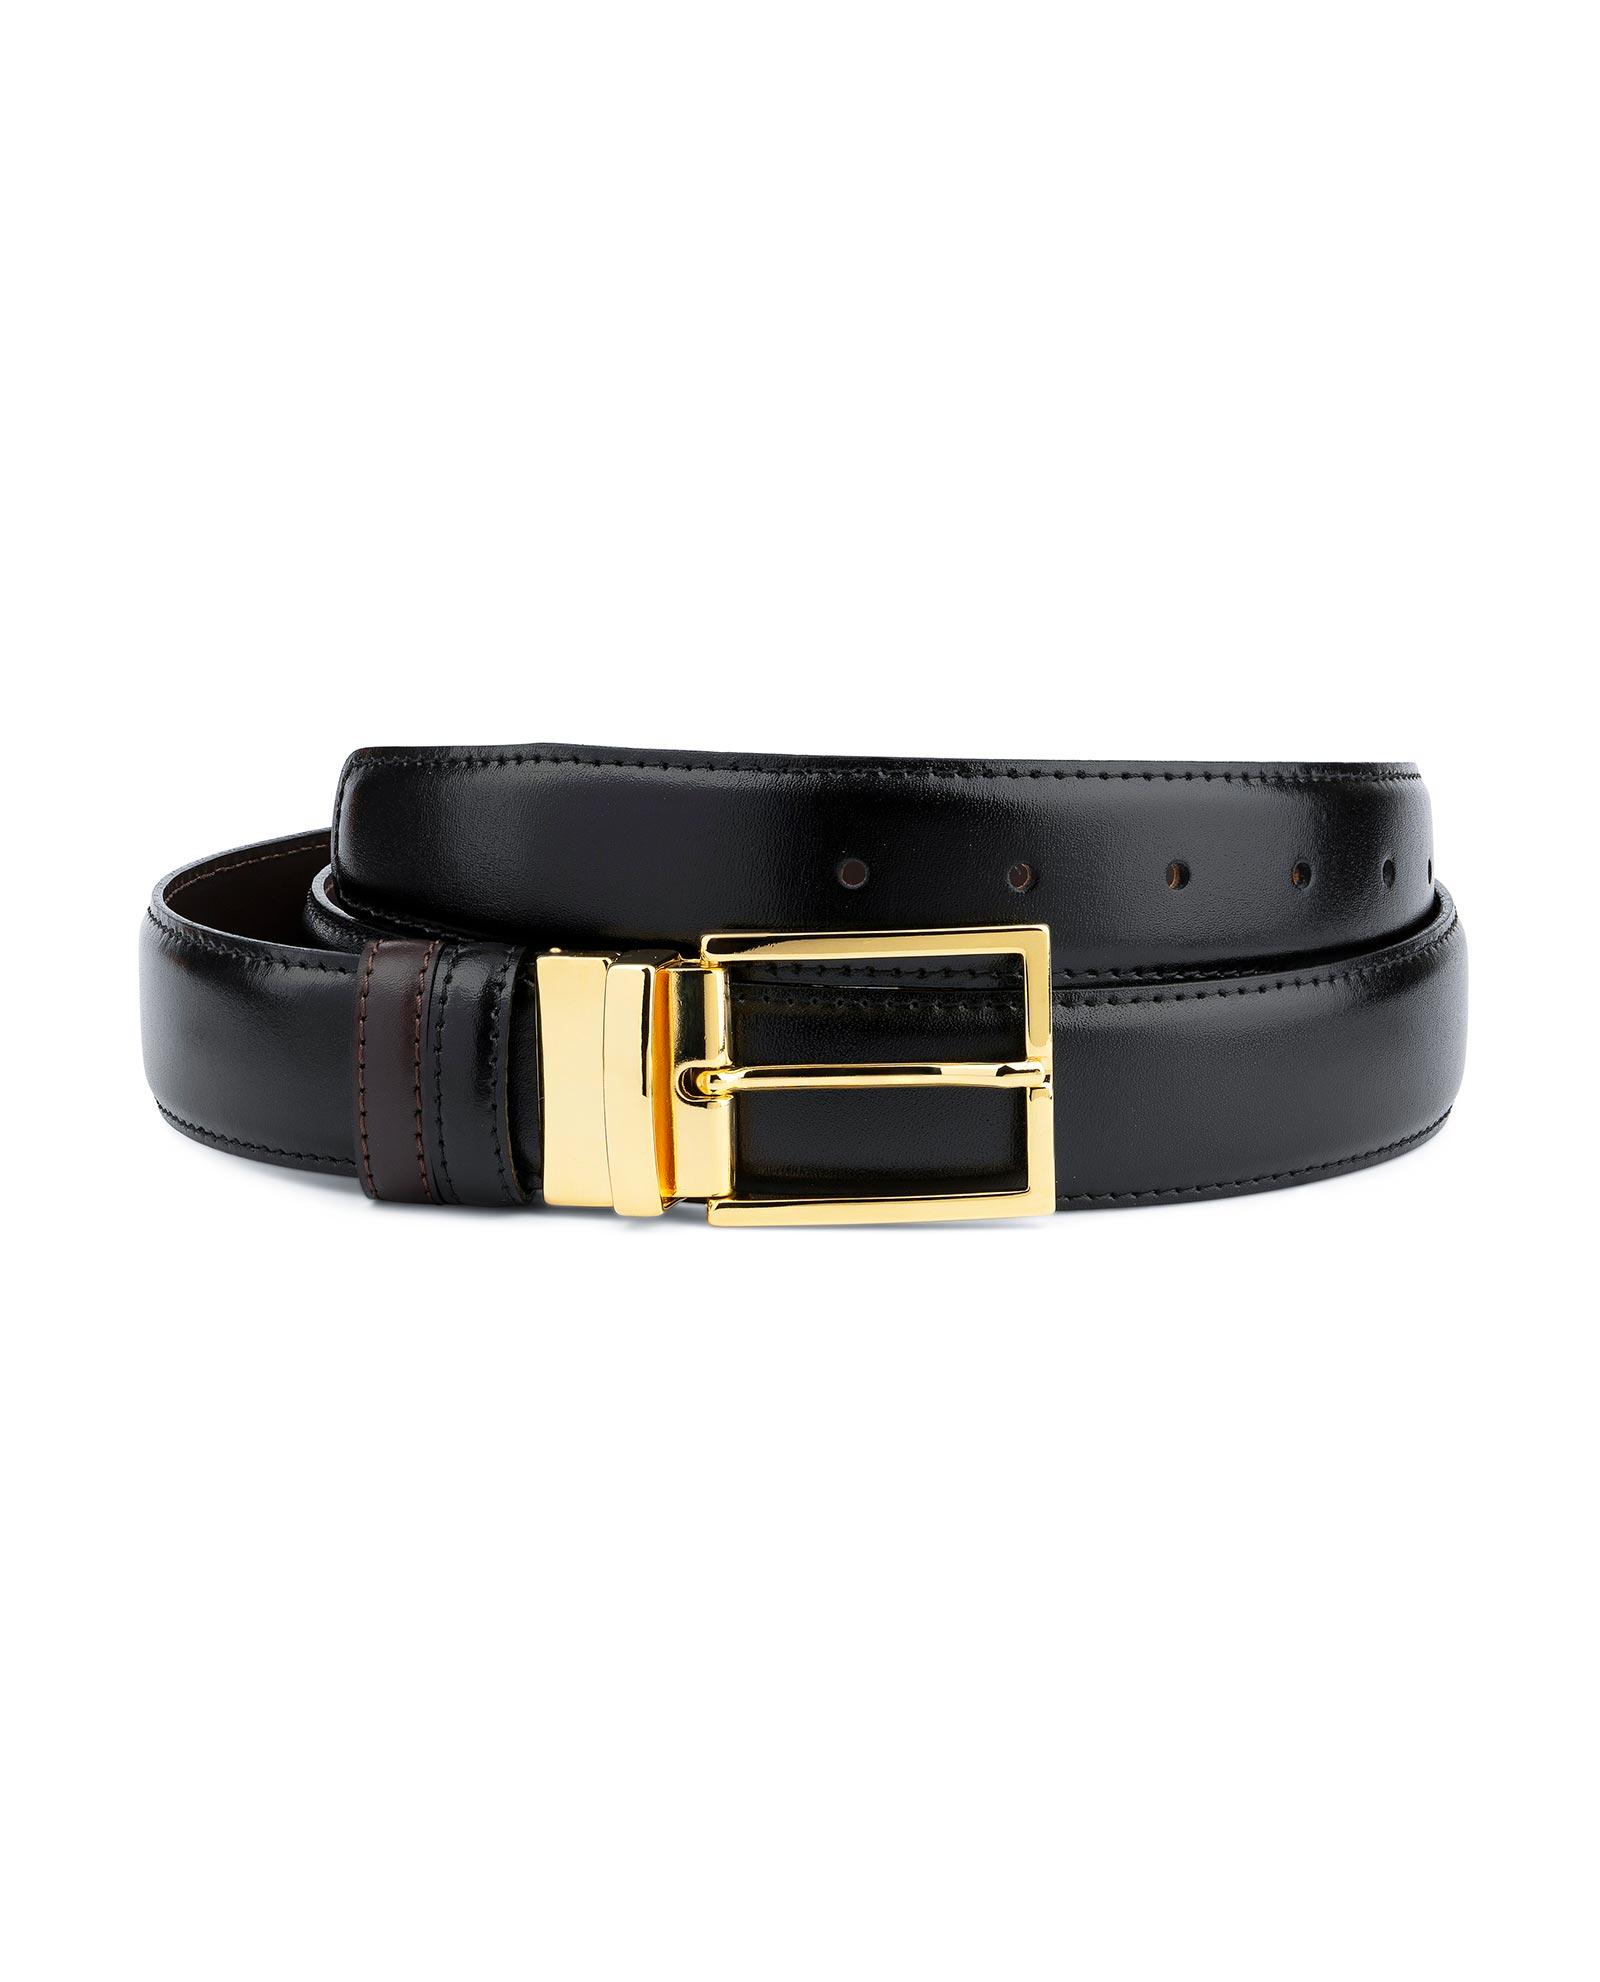 Reversible belt Mens belts with Gold buckle Dress Black brown 100% leather  | eBay